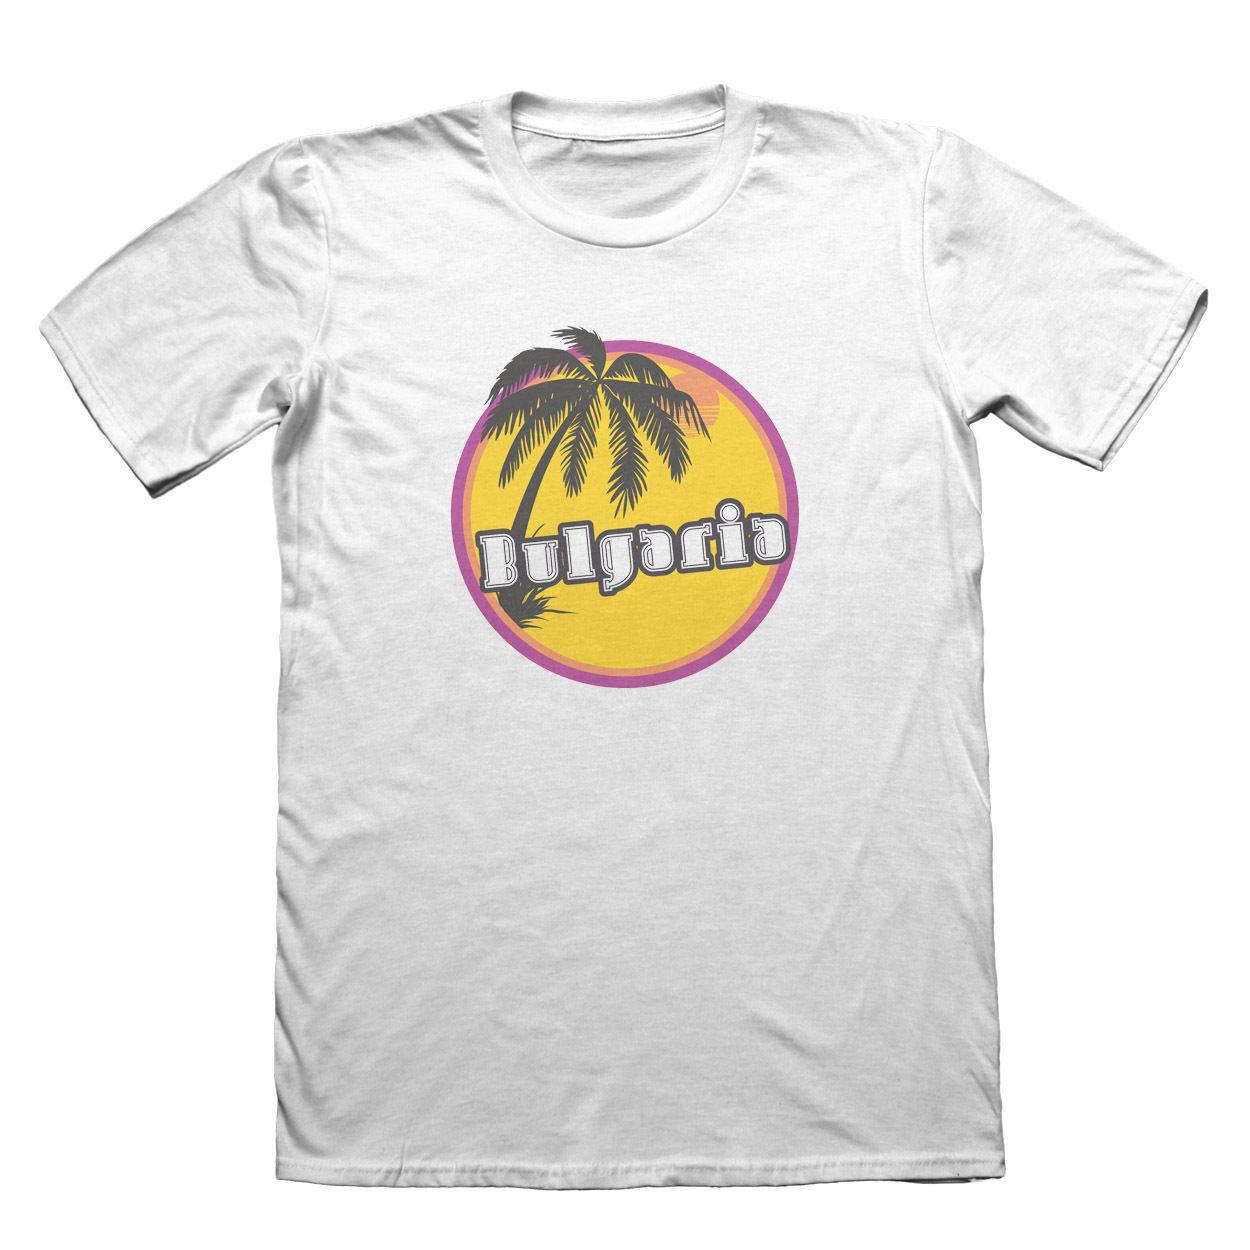 Bulgaria Sunset Beach T-Shirt - Mens Fathers Day Christmas Printed T Shirt Short Sleeve Men High Quality For Man Better